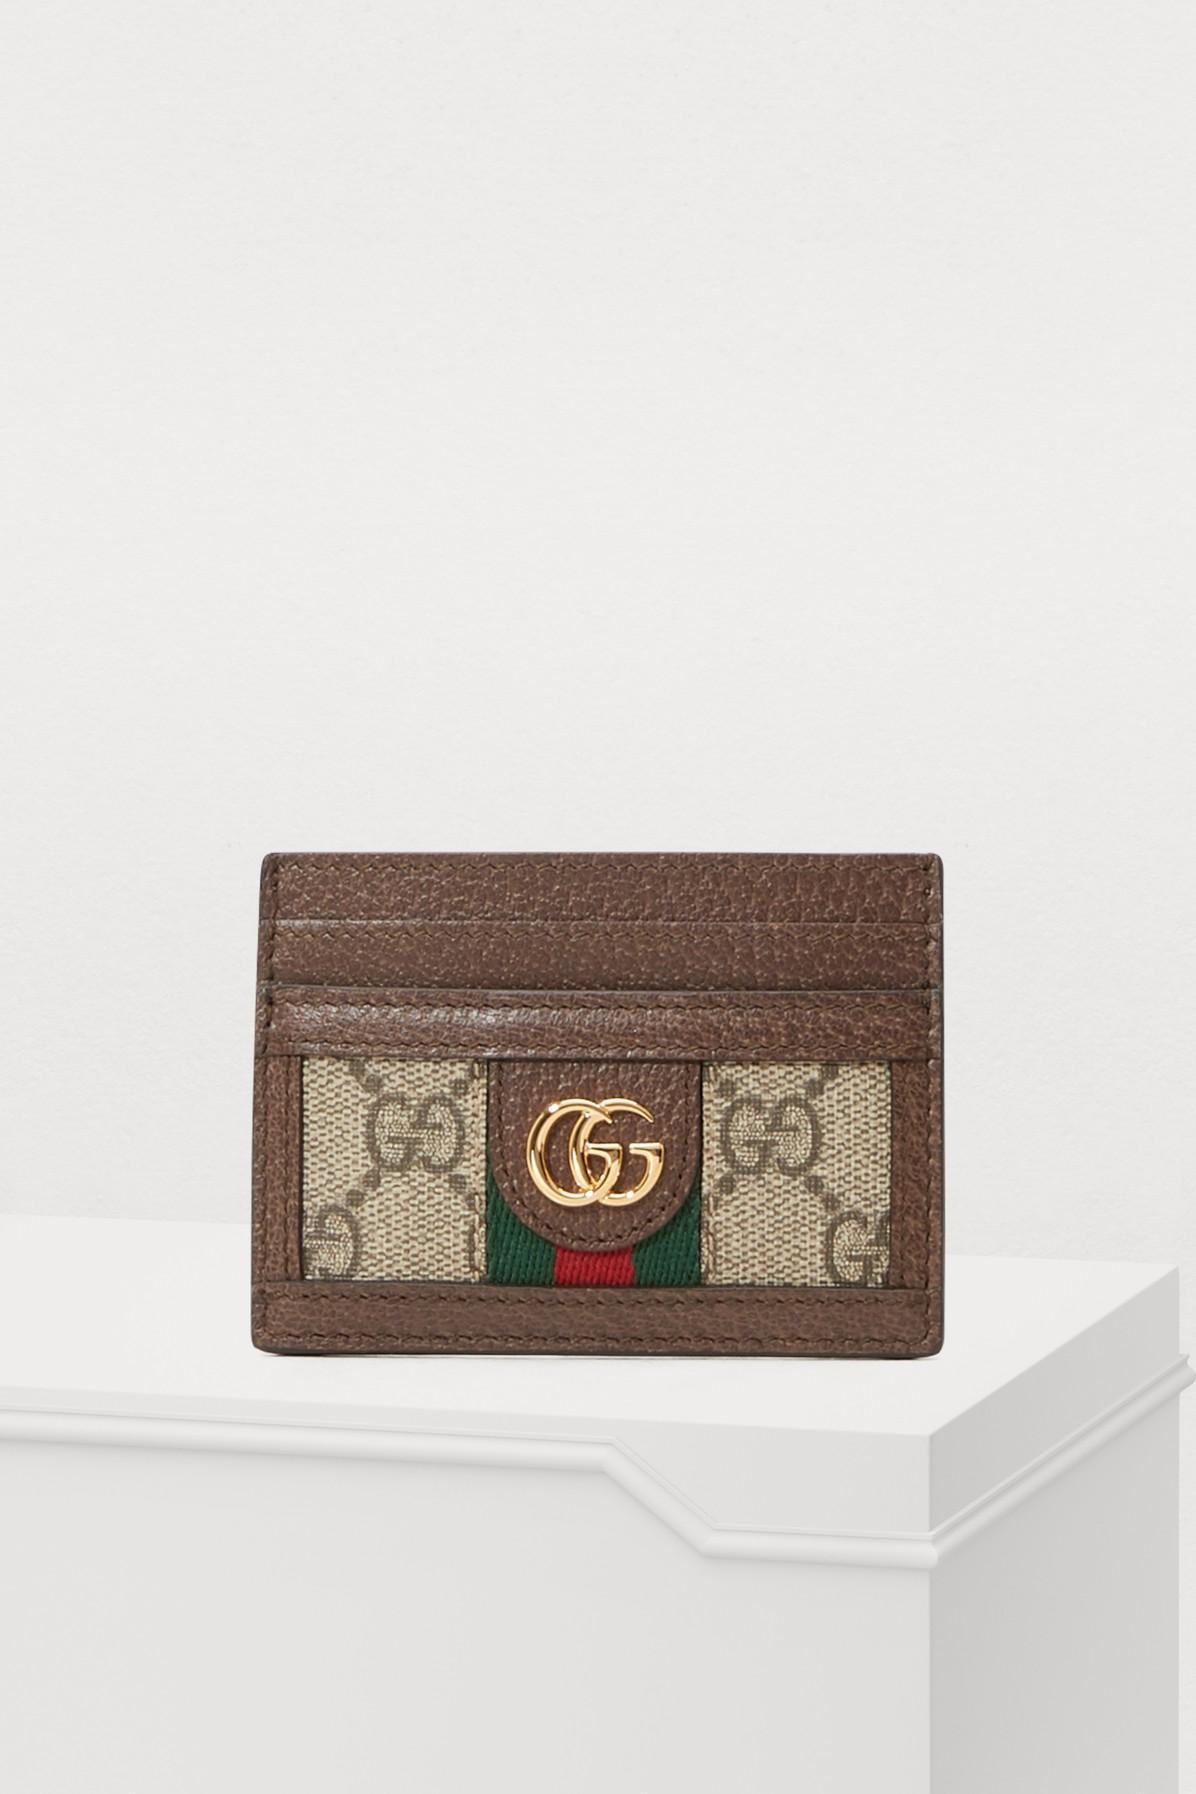 d6c303e23c3 Gucci Women s Beige Gg Supreme Cardholer Card Holder In Neutrals ...